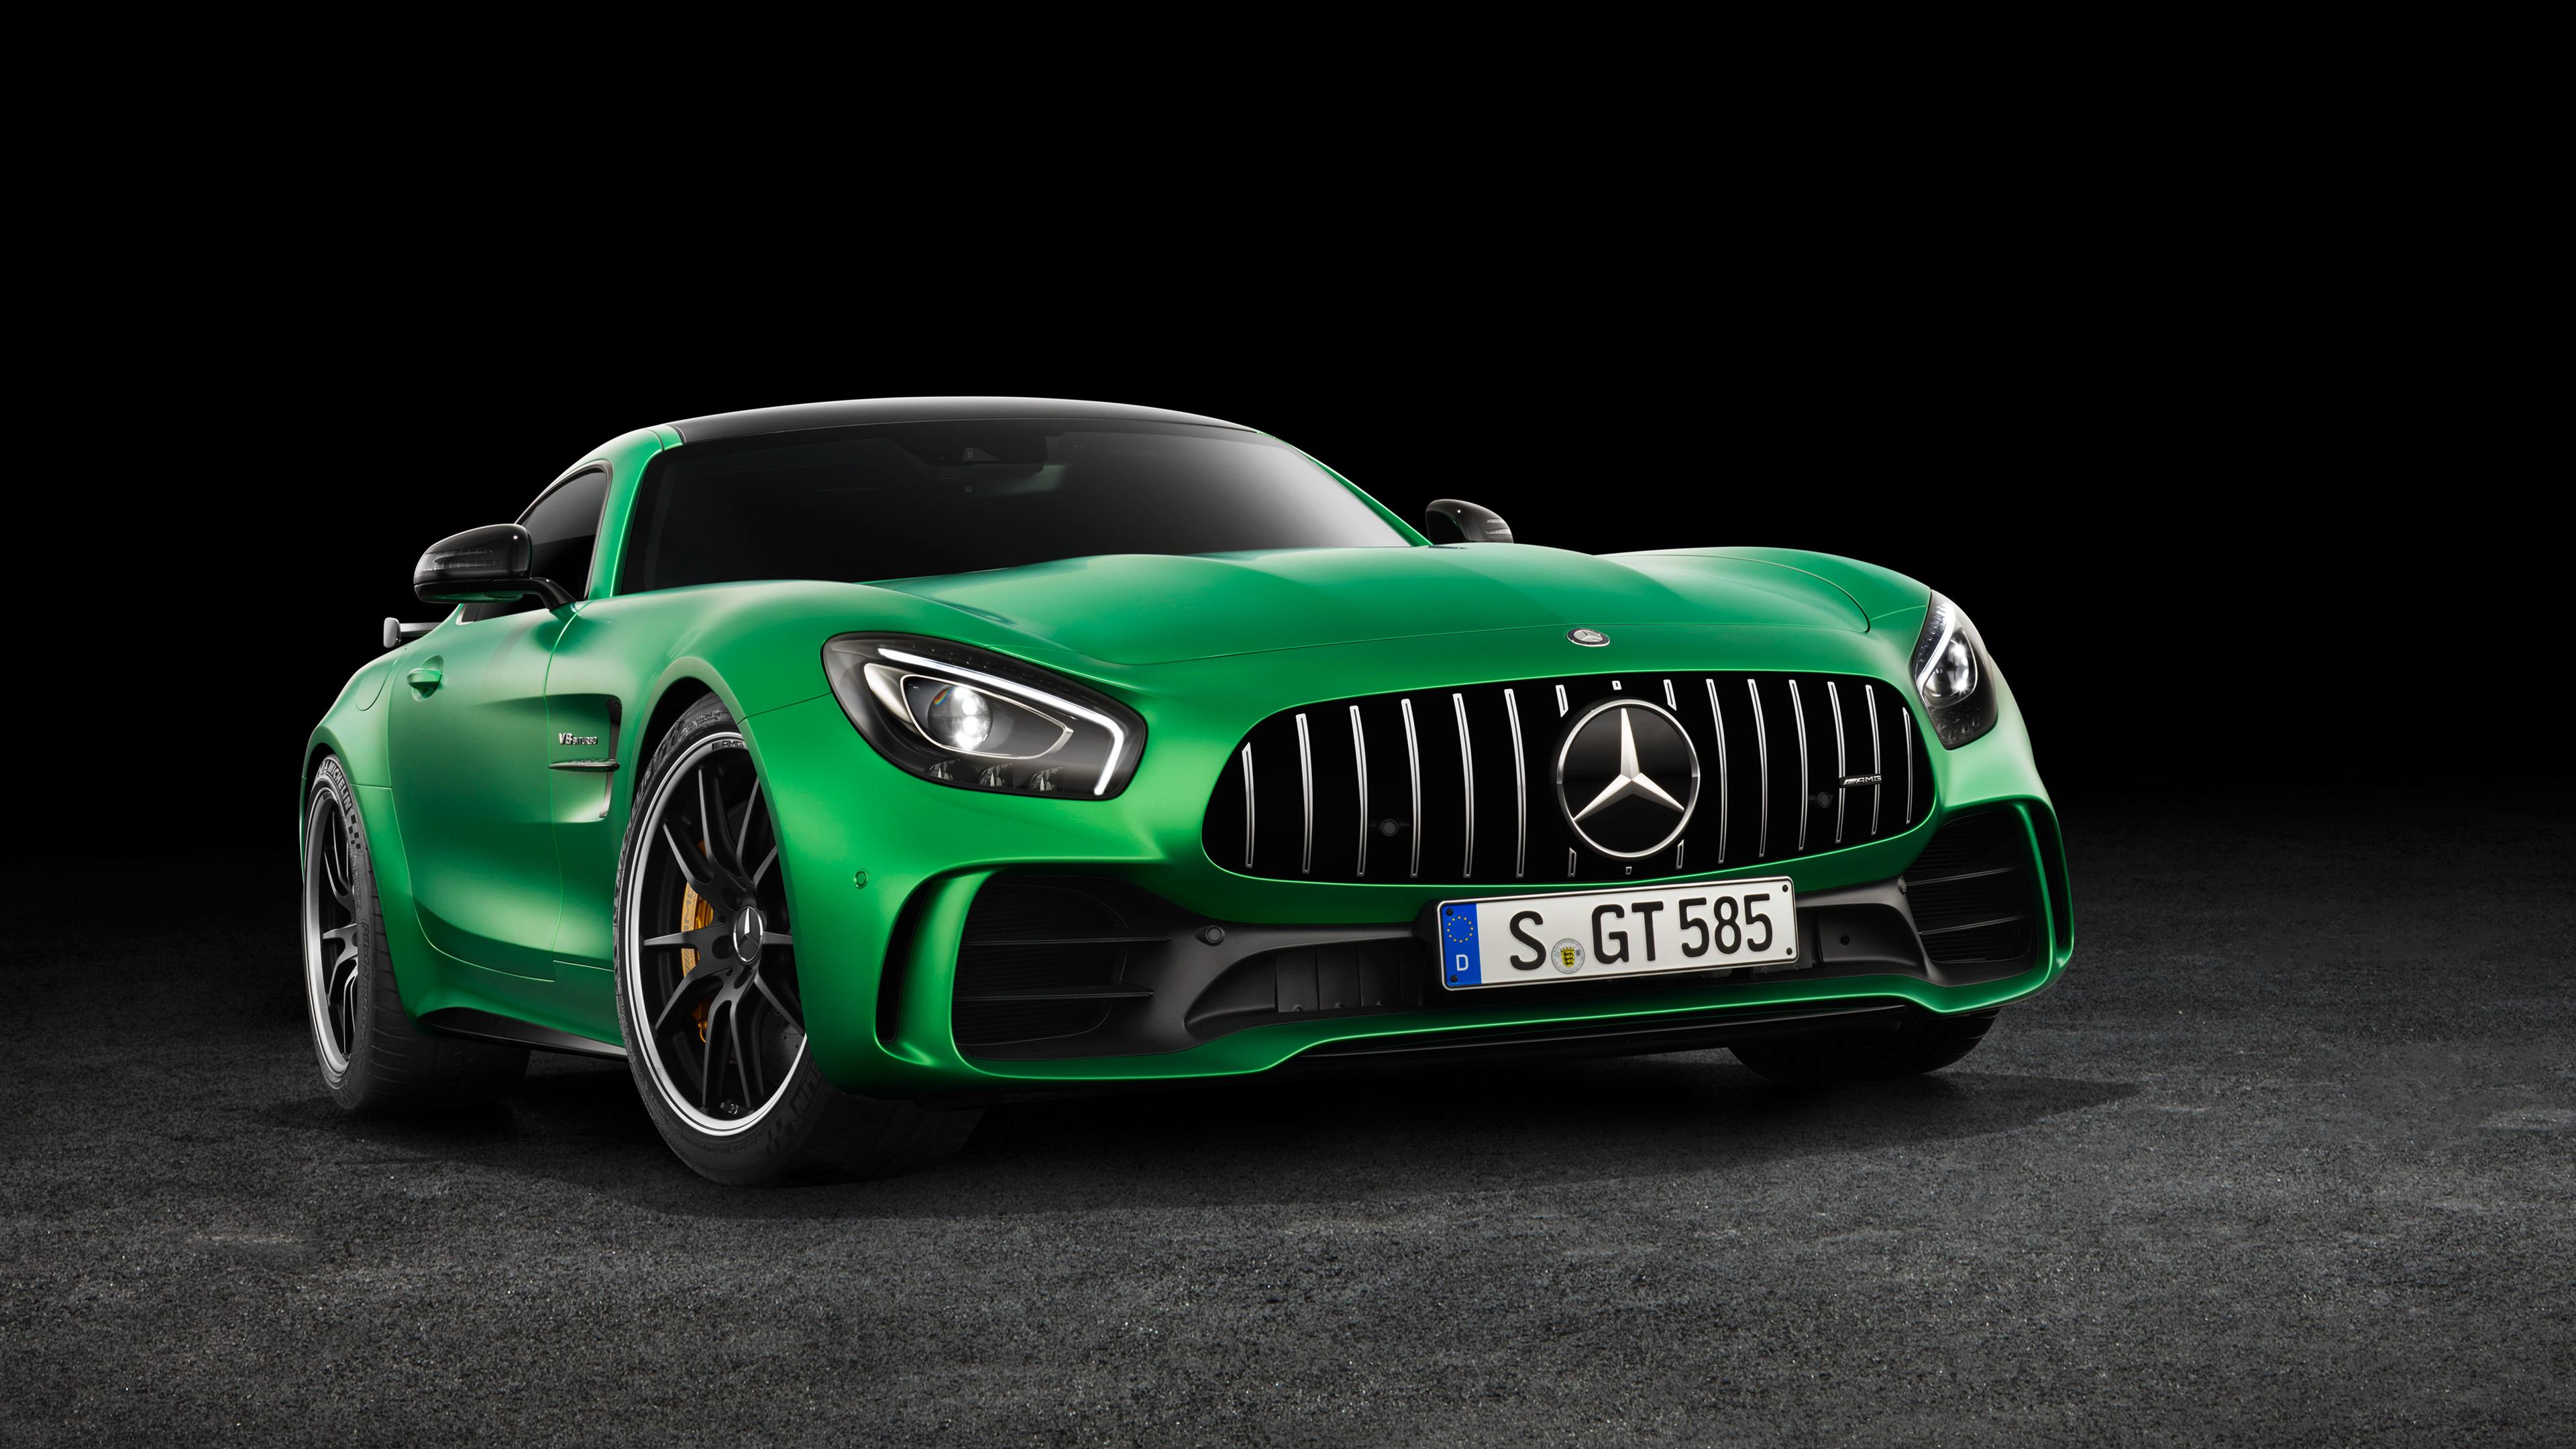 mercedes amg gt green 1539104614 - Mercedes AMG GT Green - mercedes wallpapers, mercedes benz wallpapers, cars wallpapers, amg wallpapers